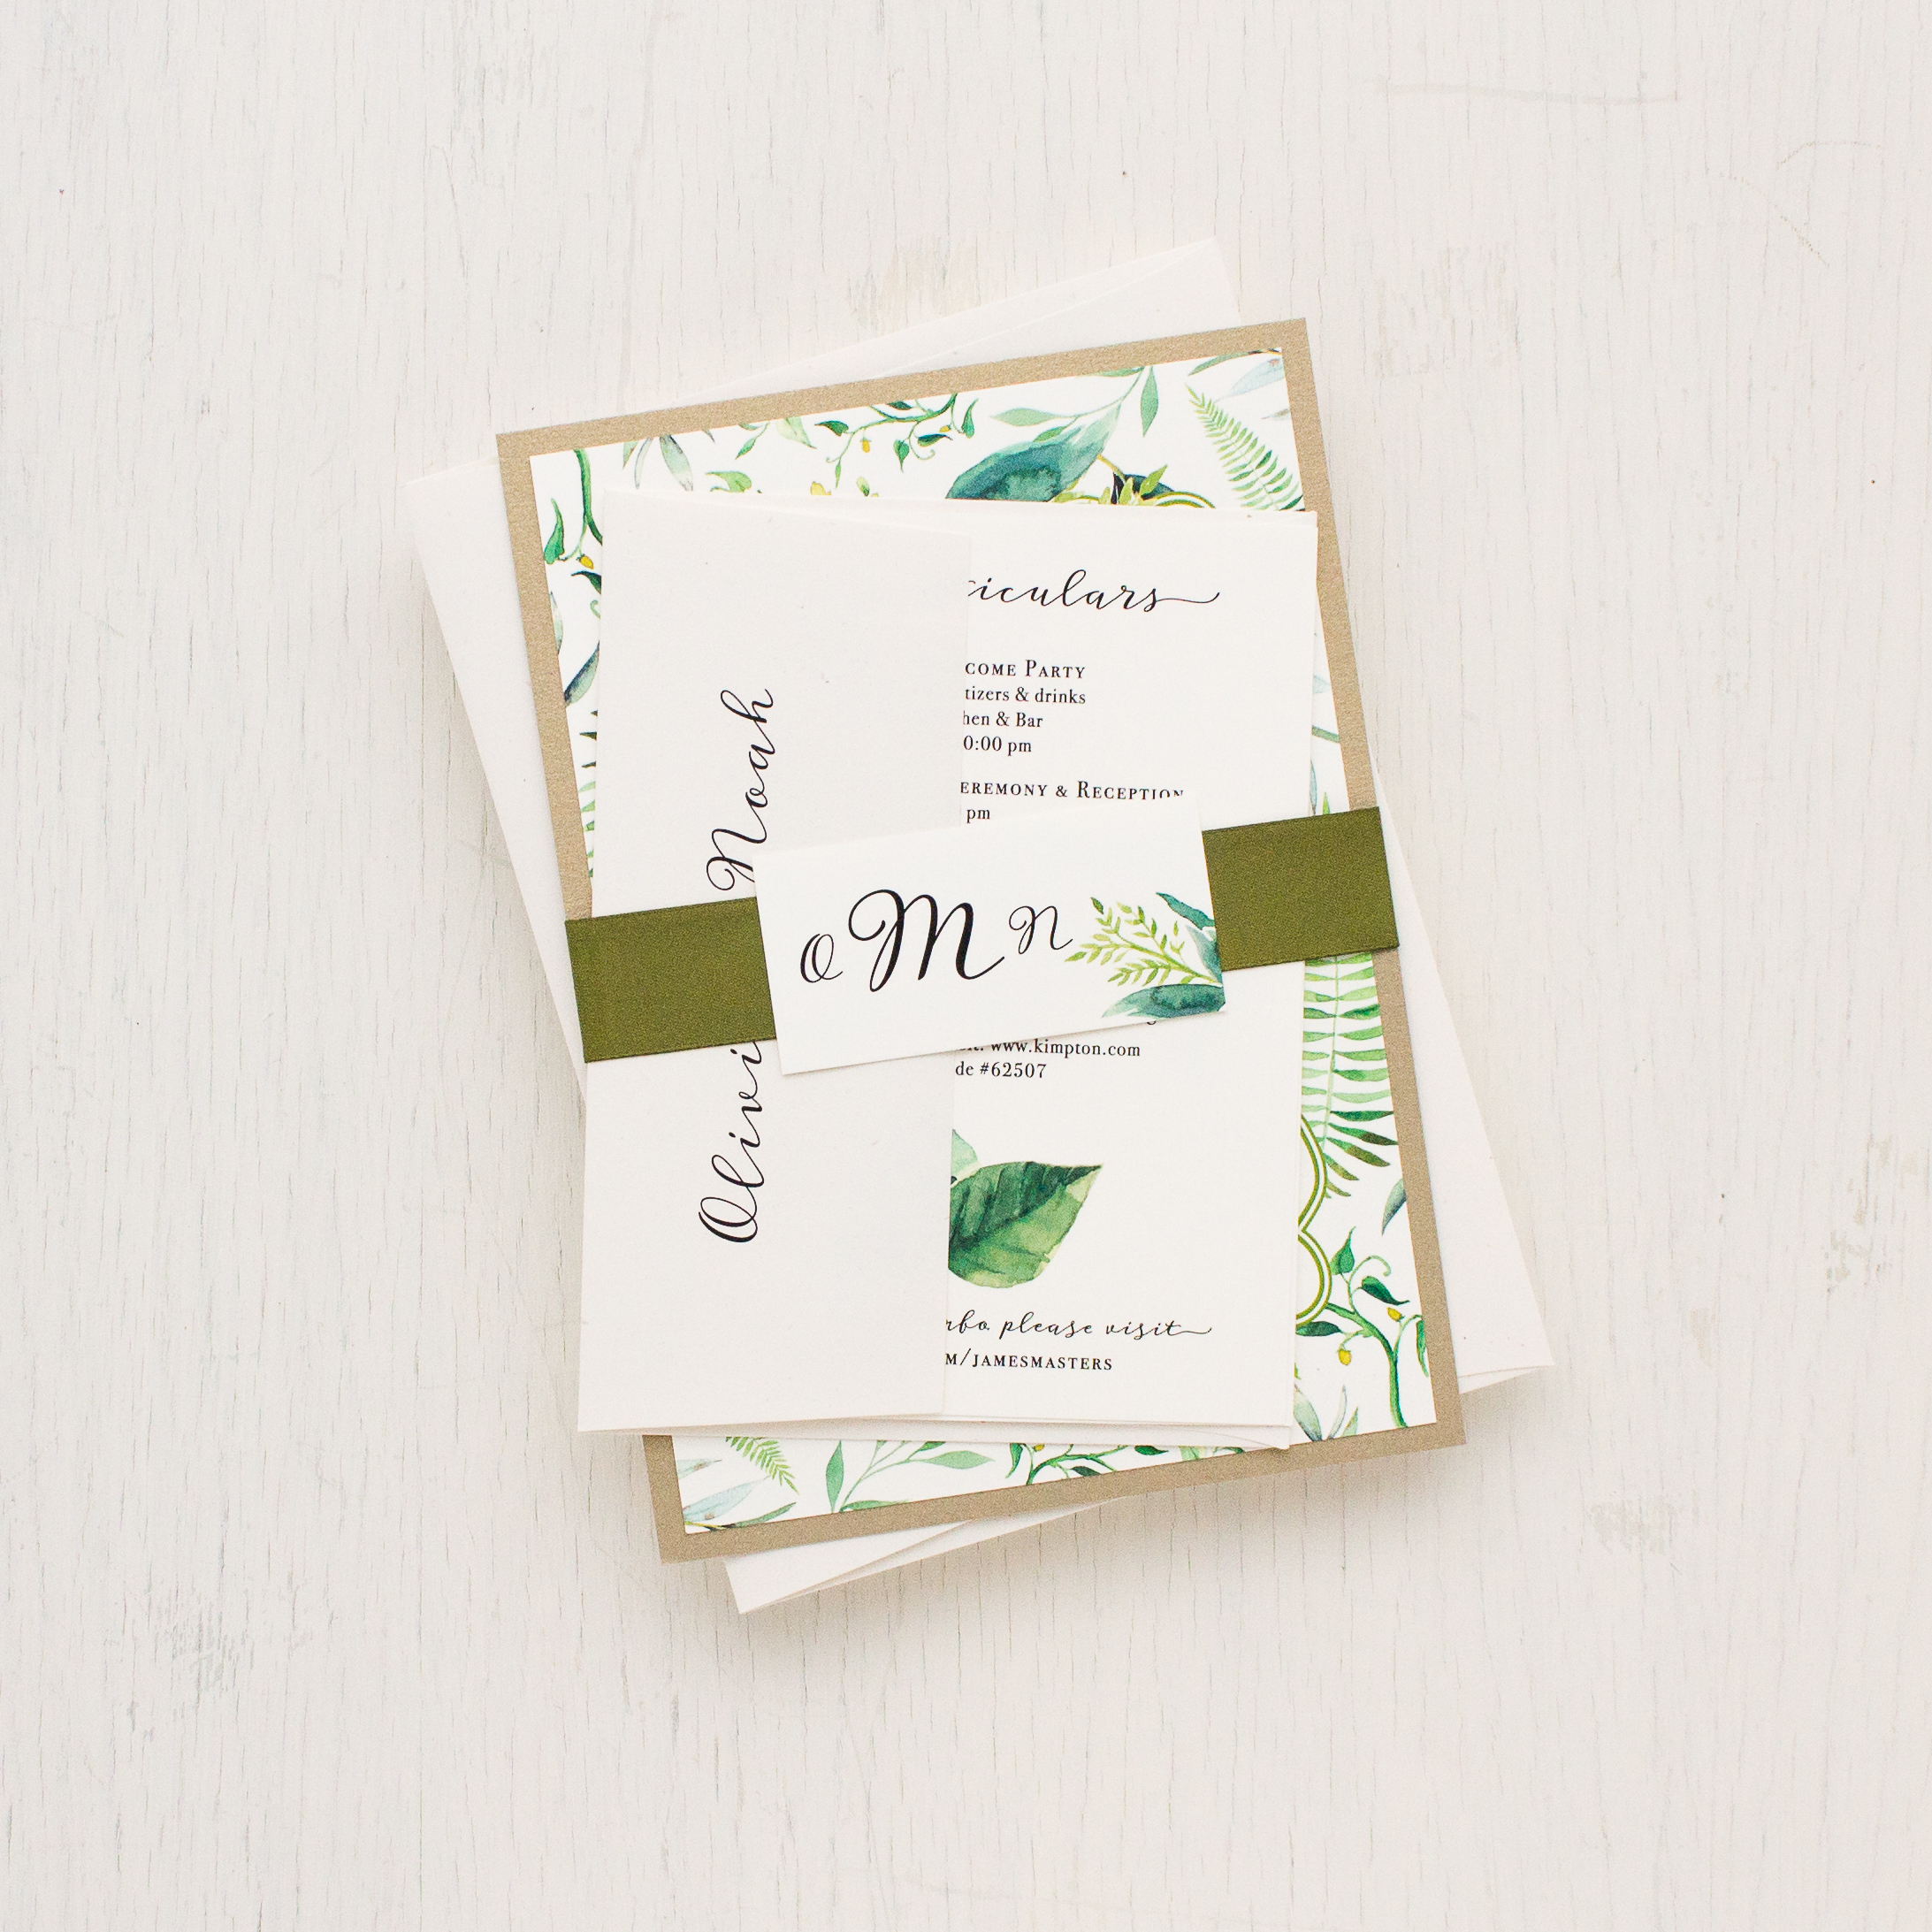 Simple Elegant Greenery Wedding Inspiration